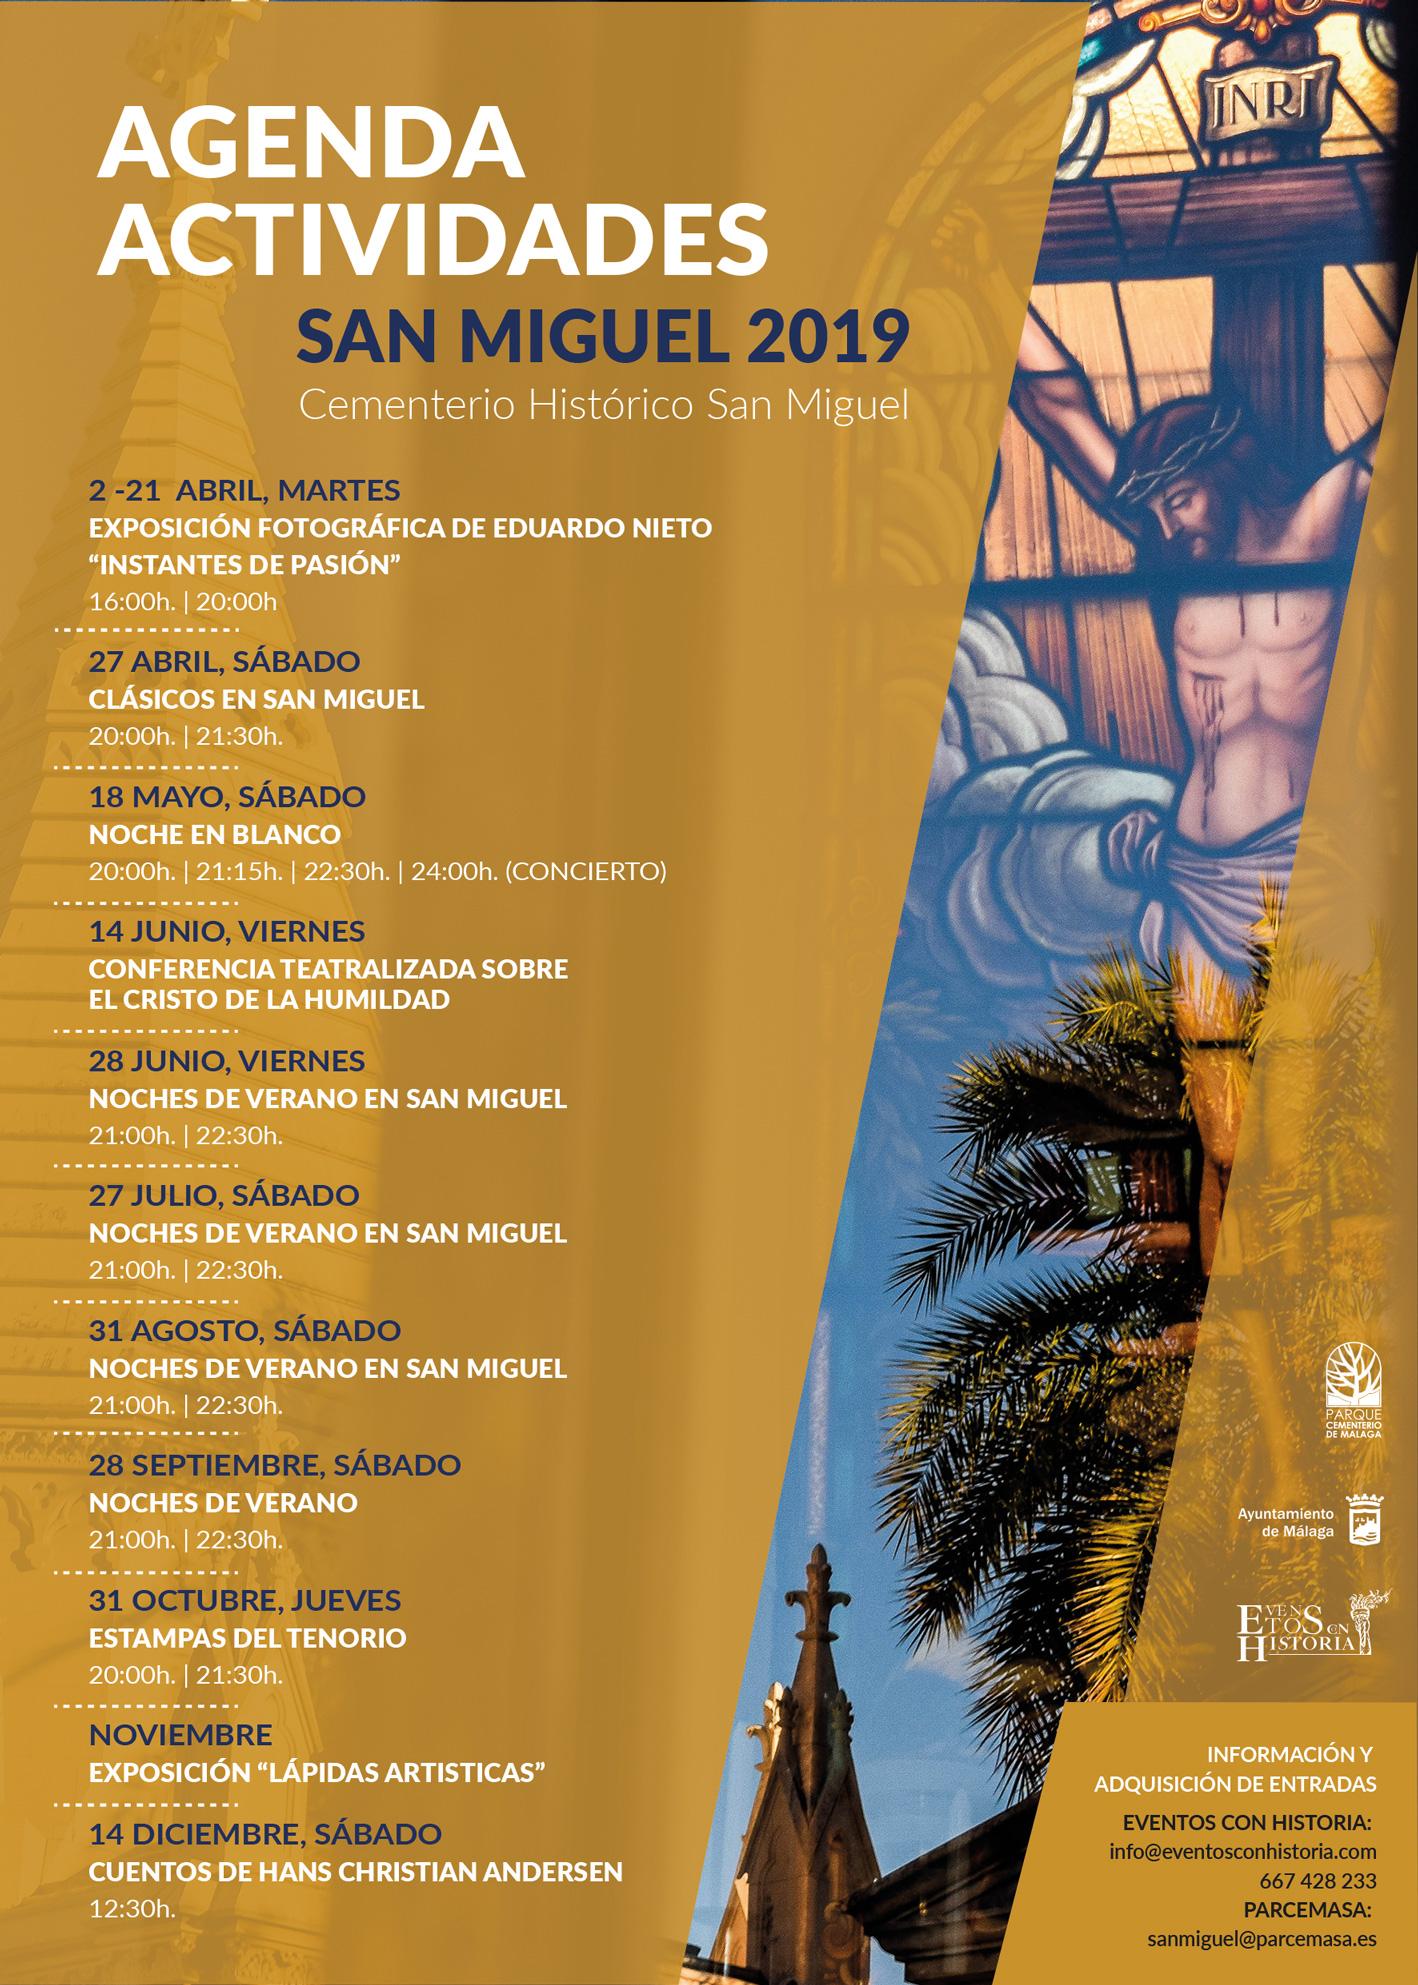 AGENDA DEFINITIVA SAN MIGUEL 2019